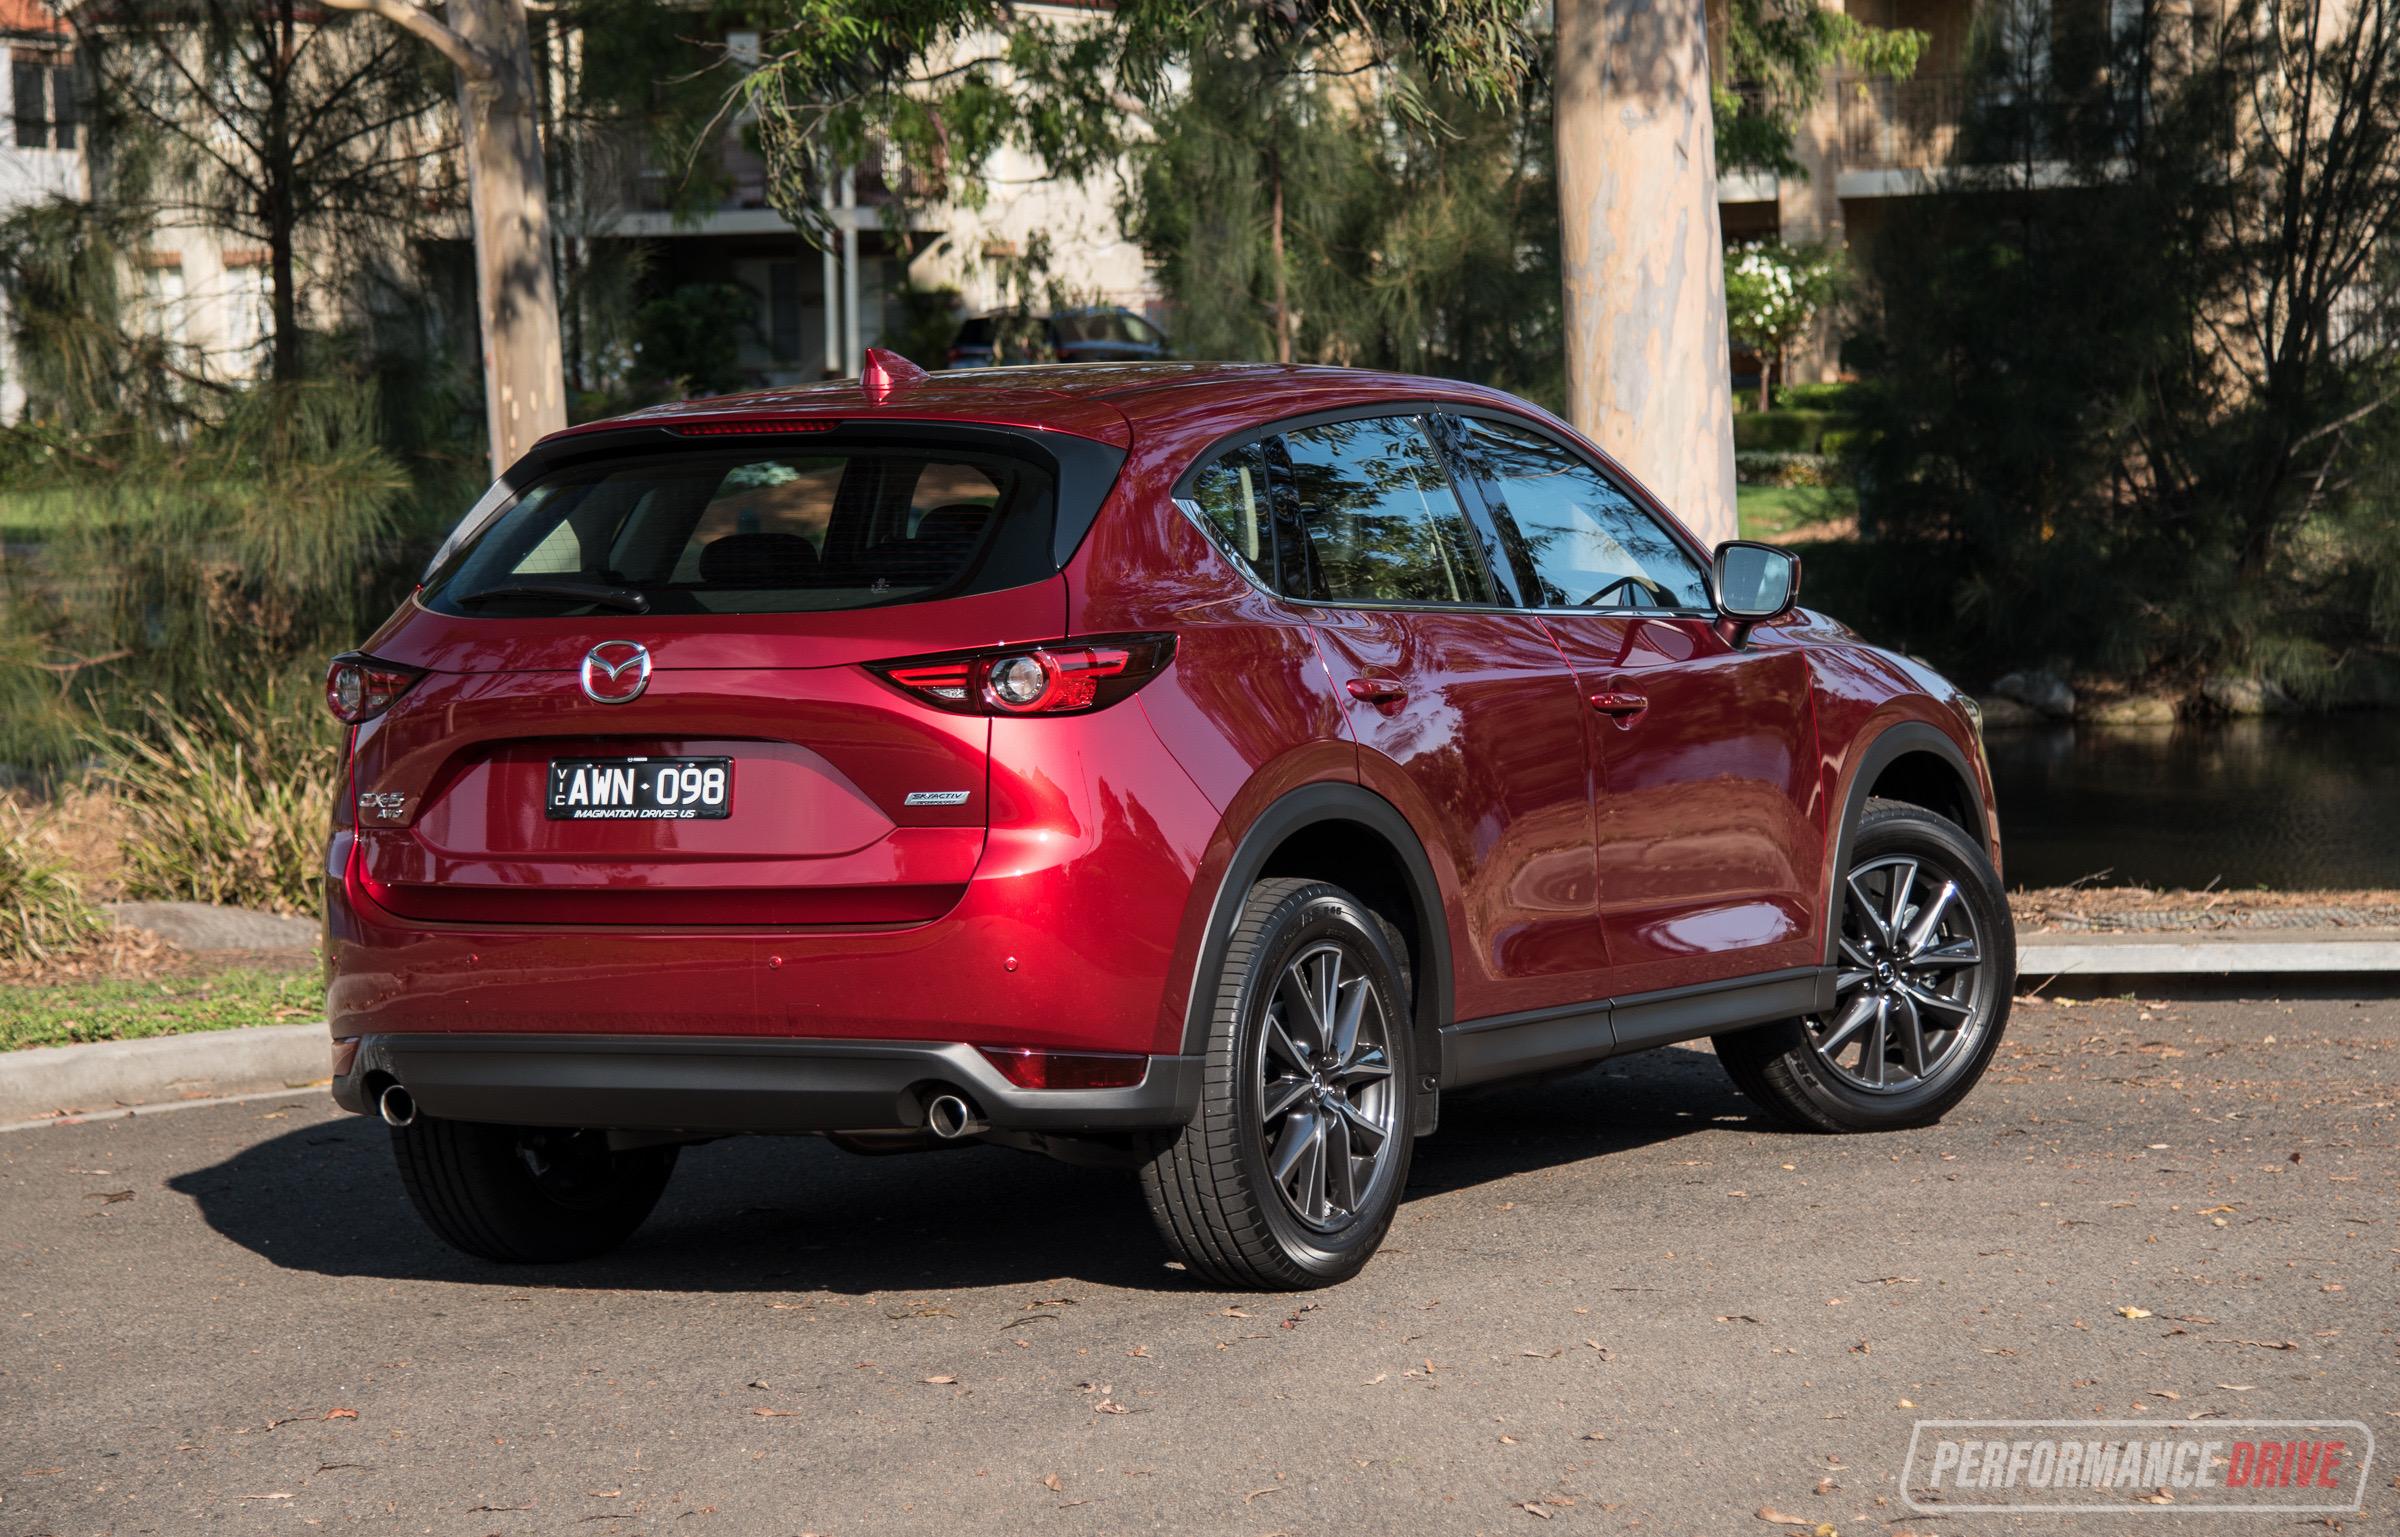 Kelebihan Mazda Cx 5 2.5 Turbo Top Model Tahun Ini